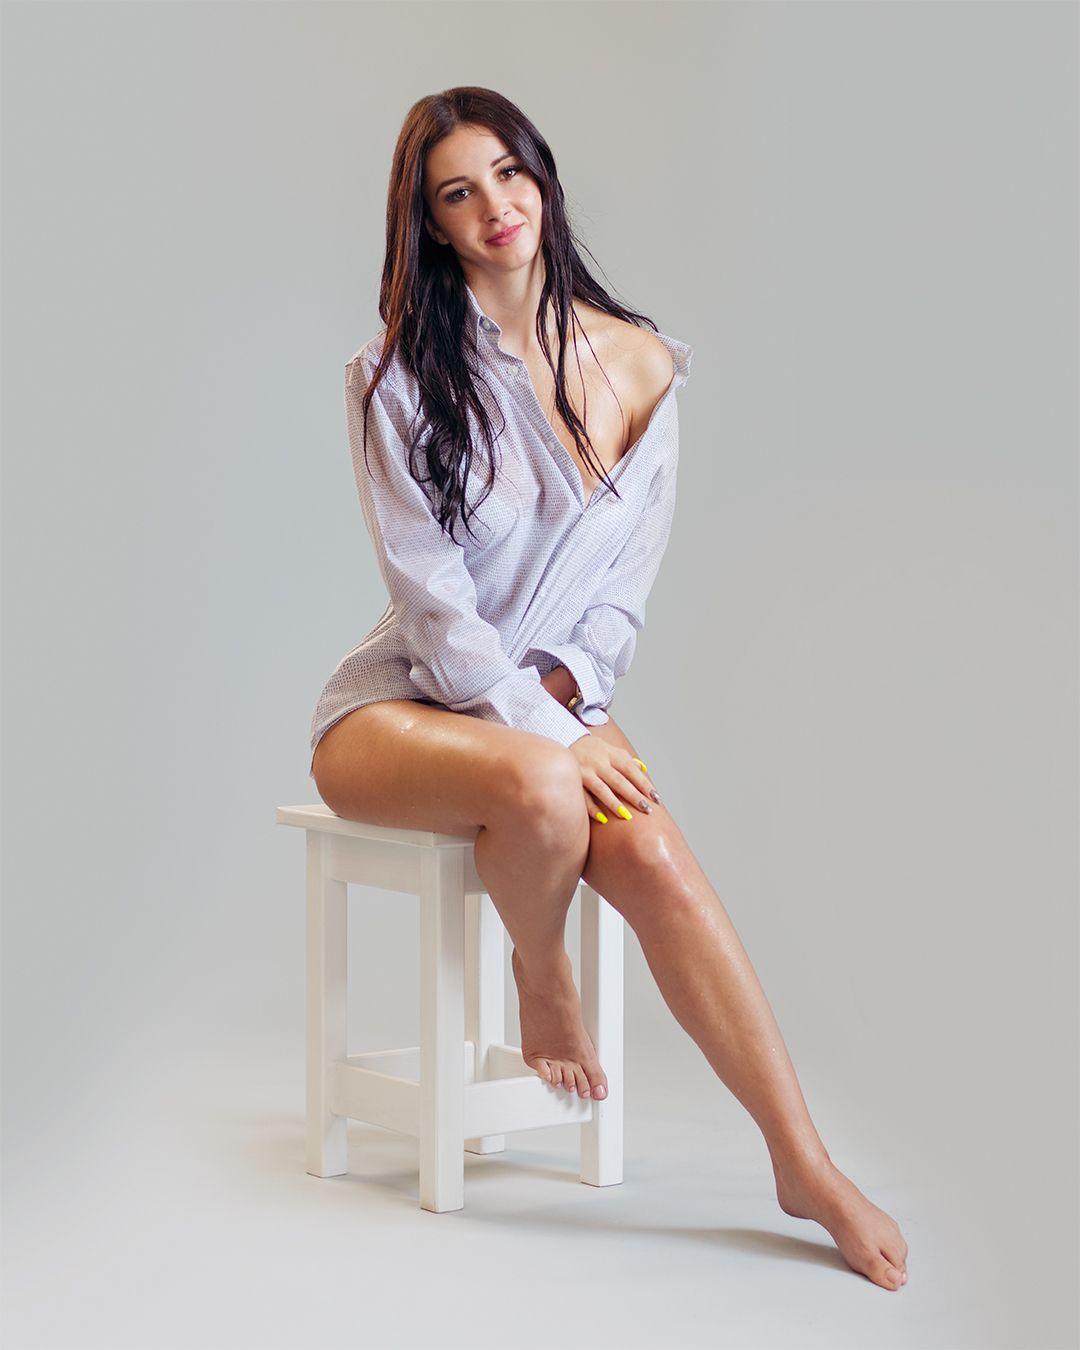 portrait, beauty, beautiful, gorgeous, lovelyface, girl, young, sweetgirl, vivi,vivien, jozefkiss,, Jozef Kiss